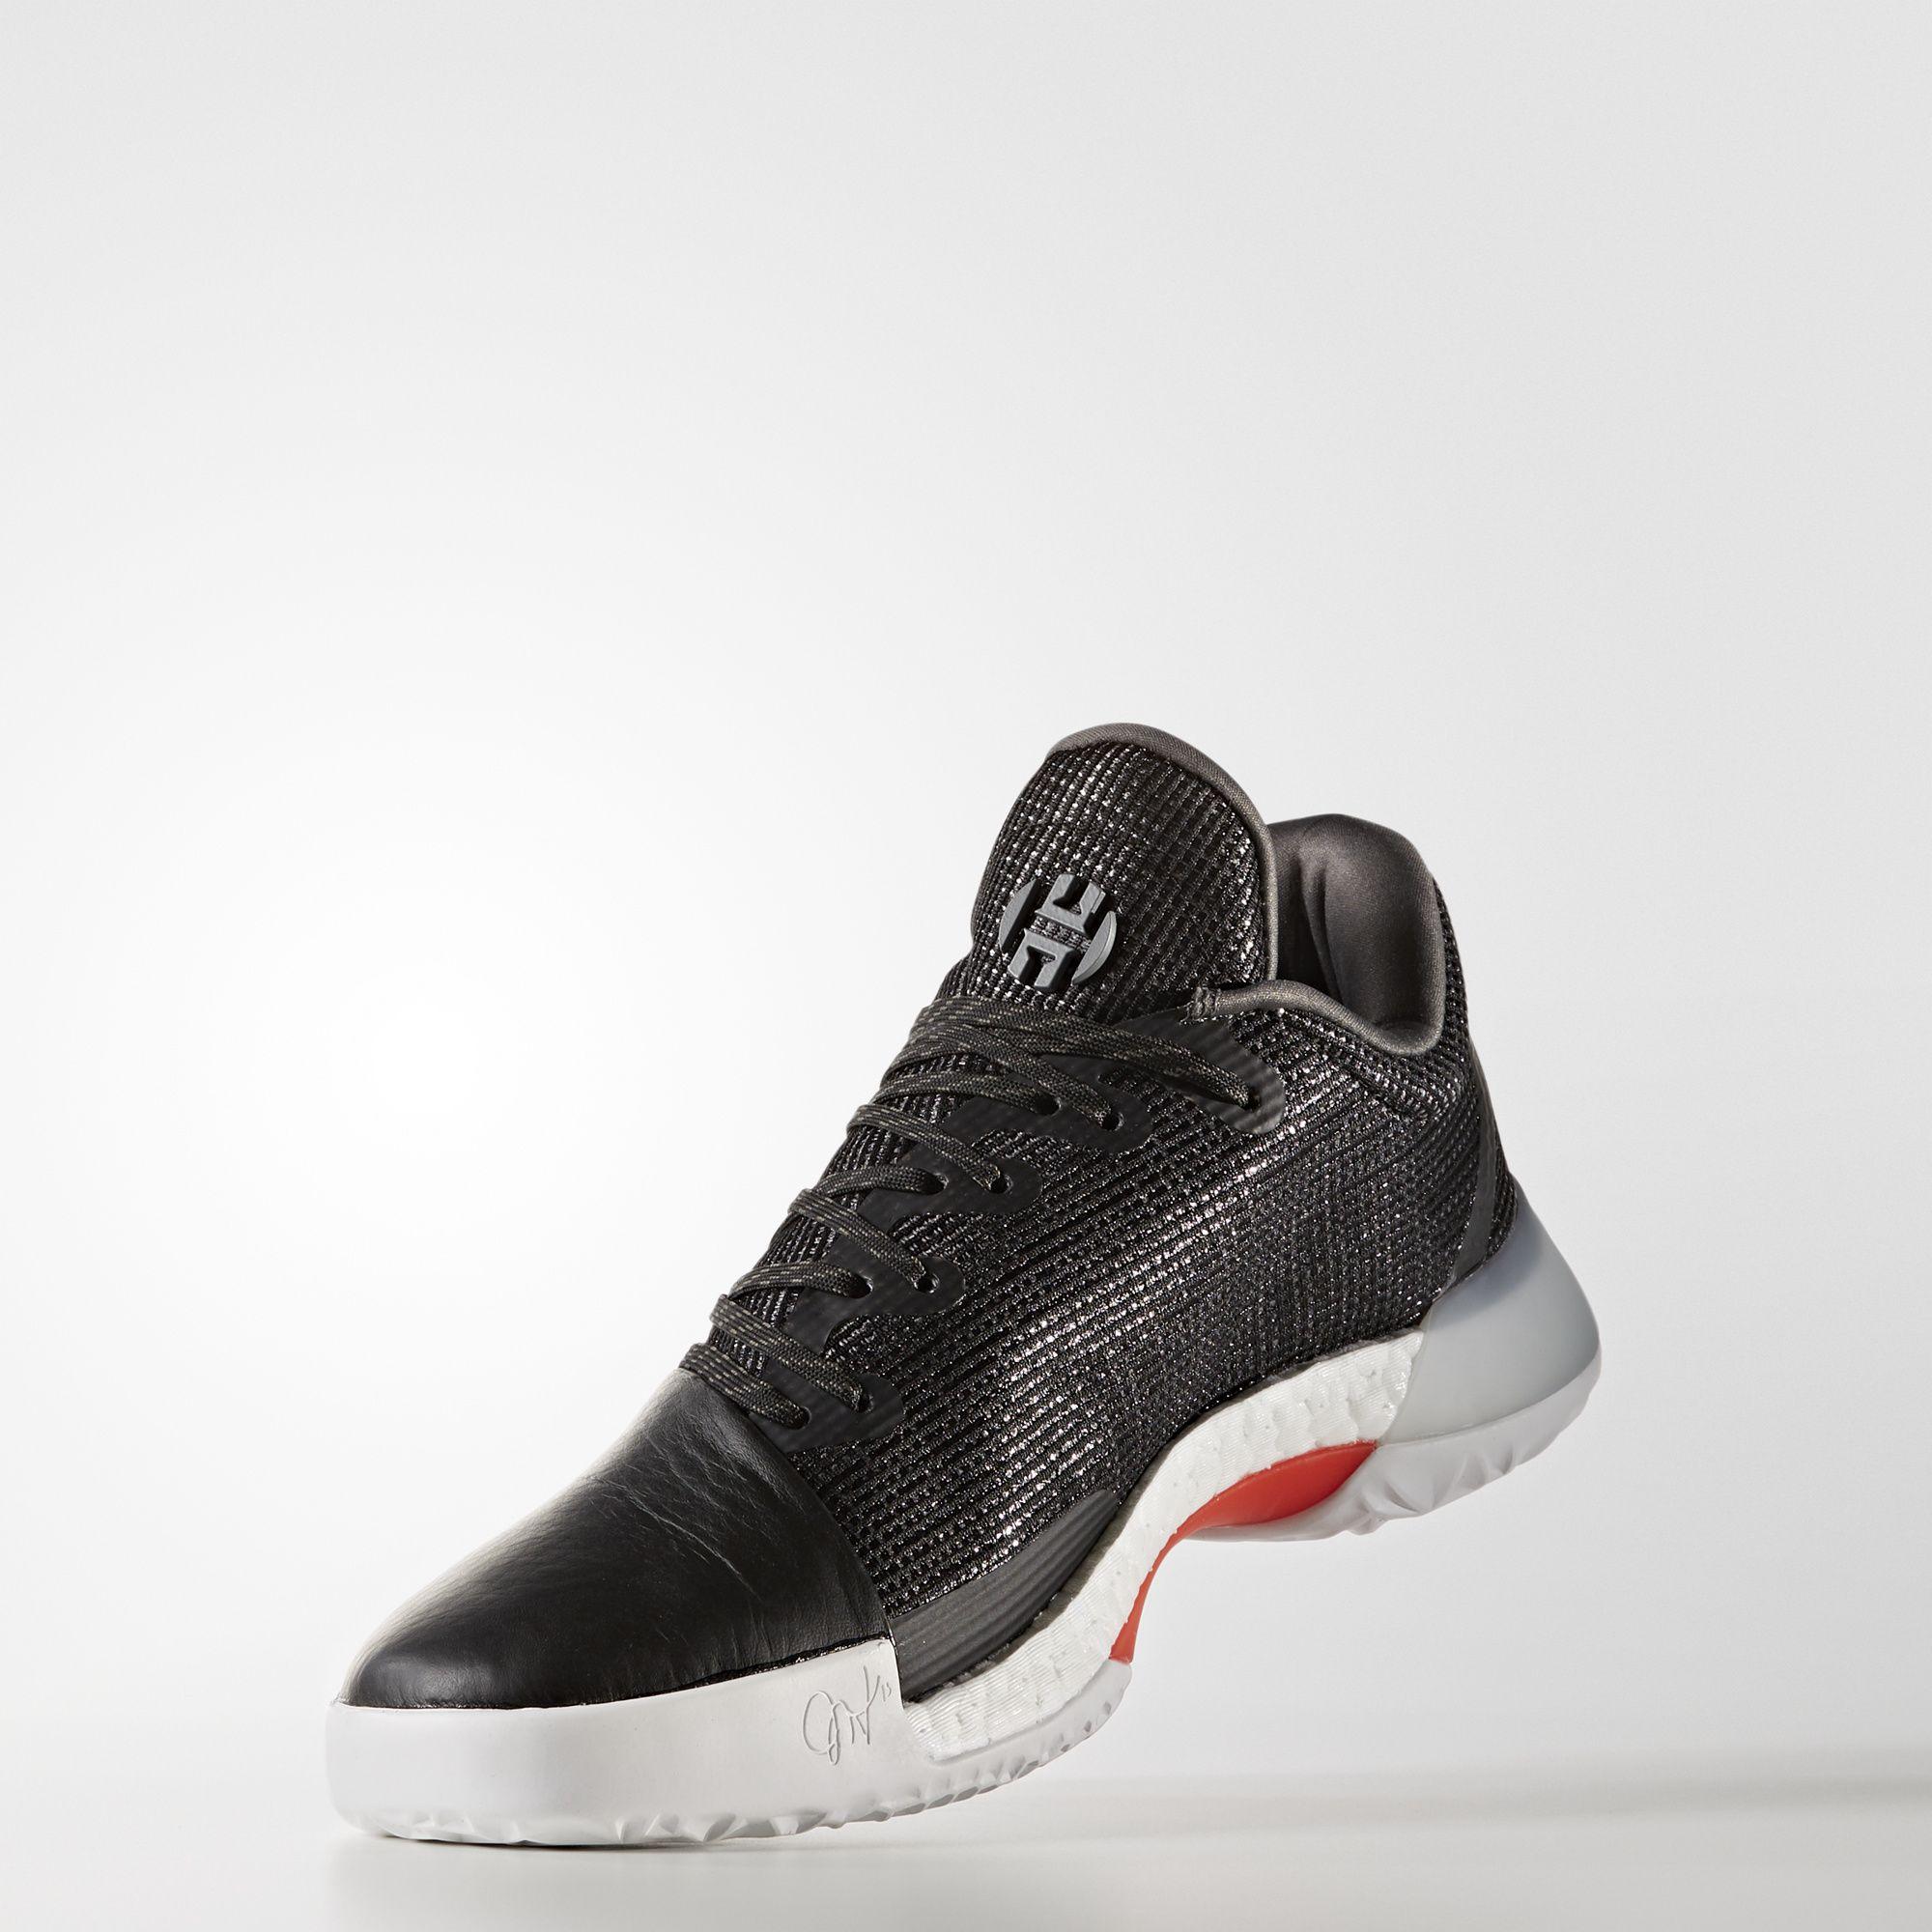 adc75de7713c adidas harden vol 1 pk black white 2 - WearTesters